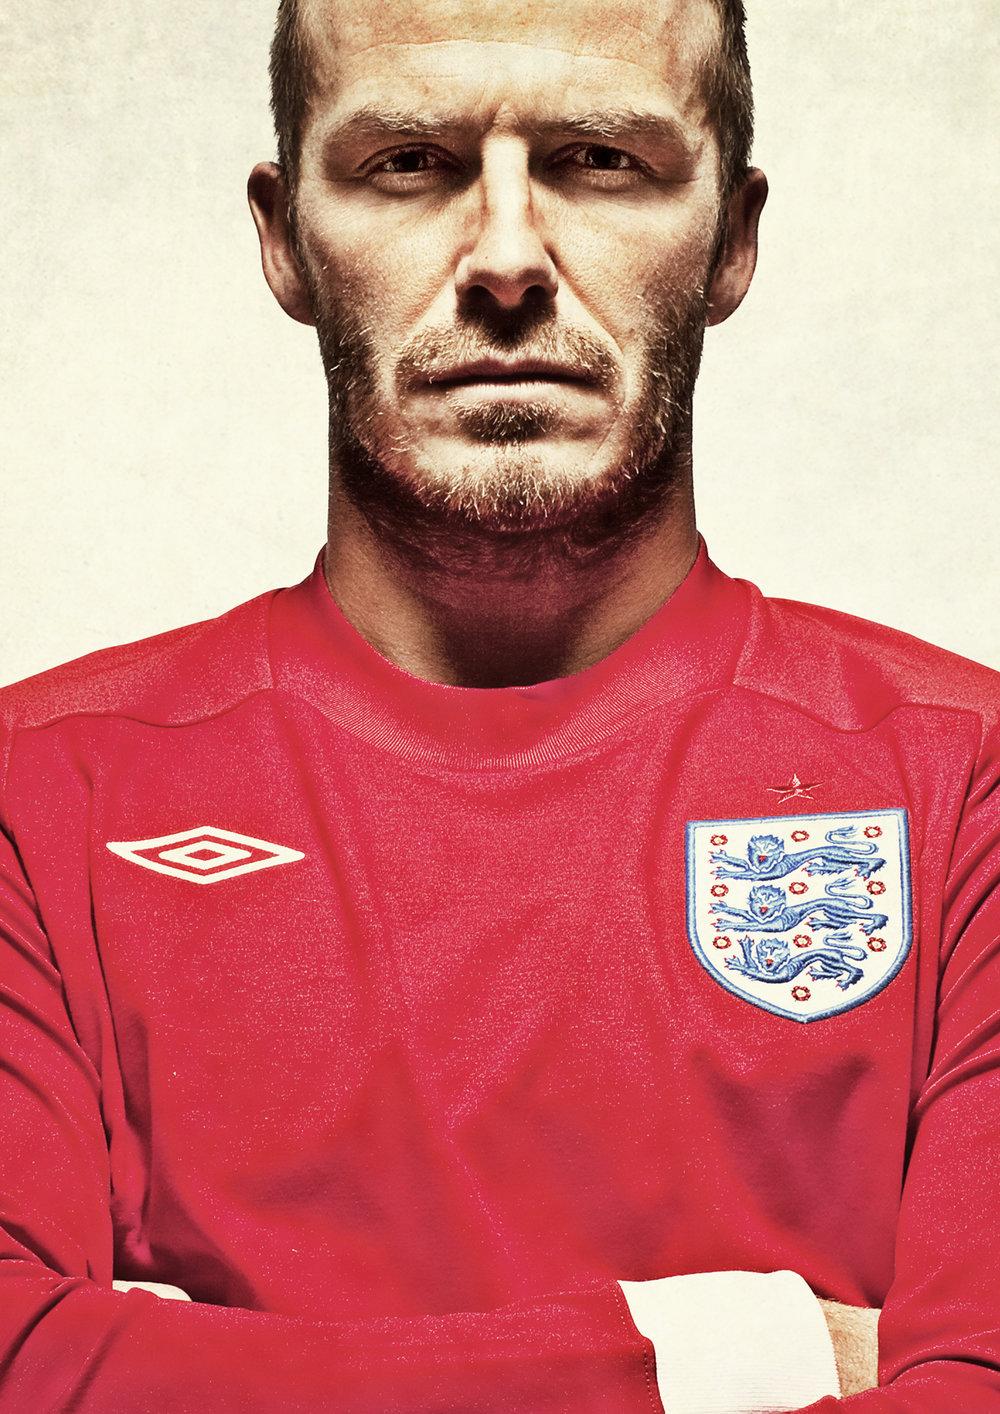 RanaldMackechnie.David Beckham. the FA.jpg